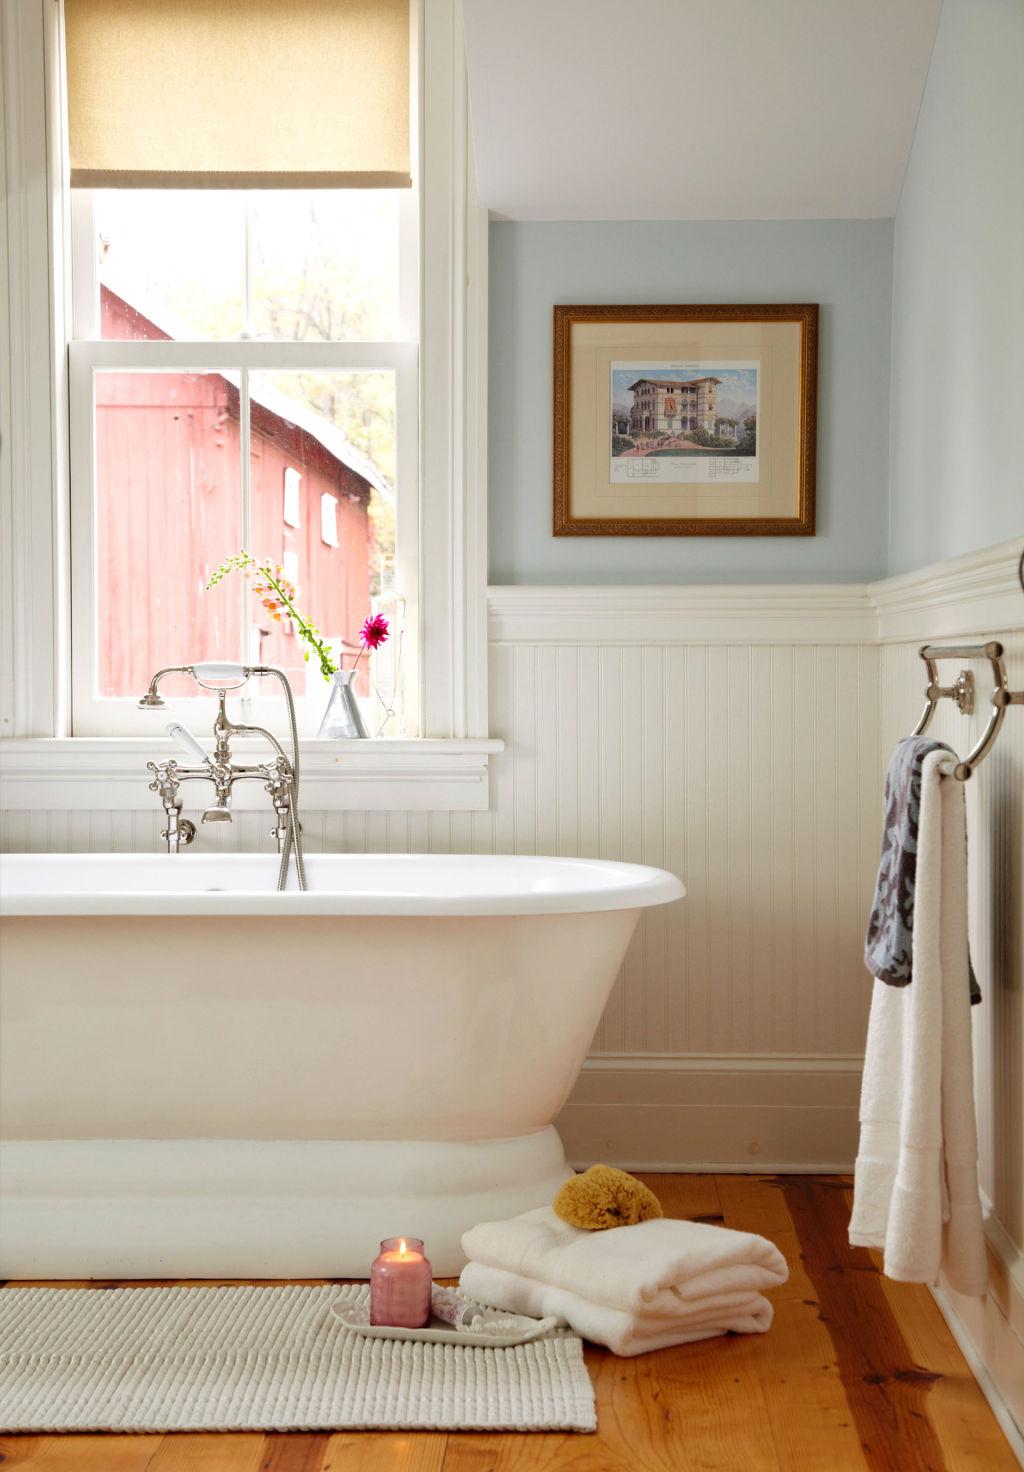 Bathroom decor bathroom decorating ideas for Country living bathroom accessories